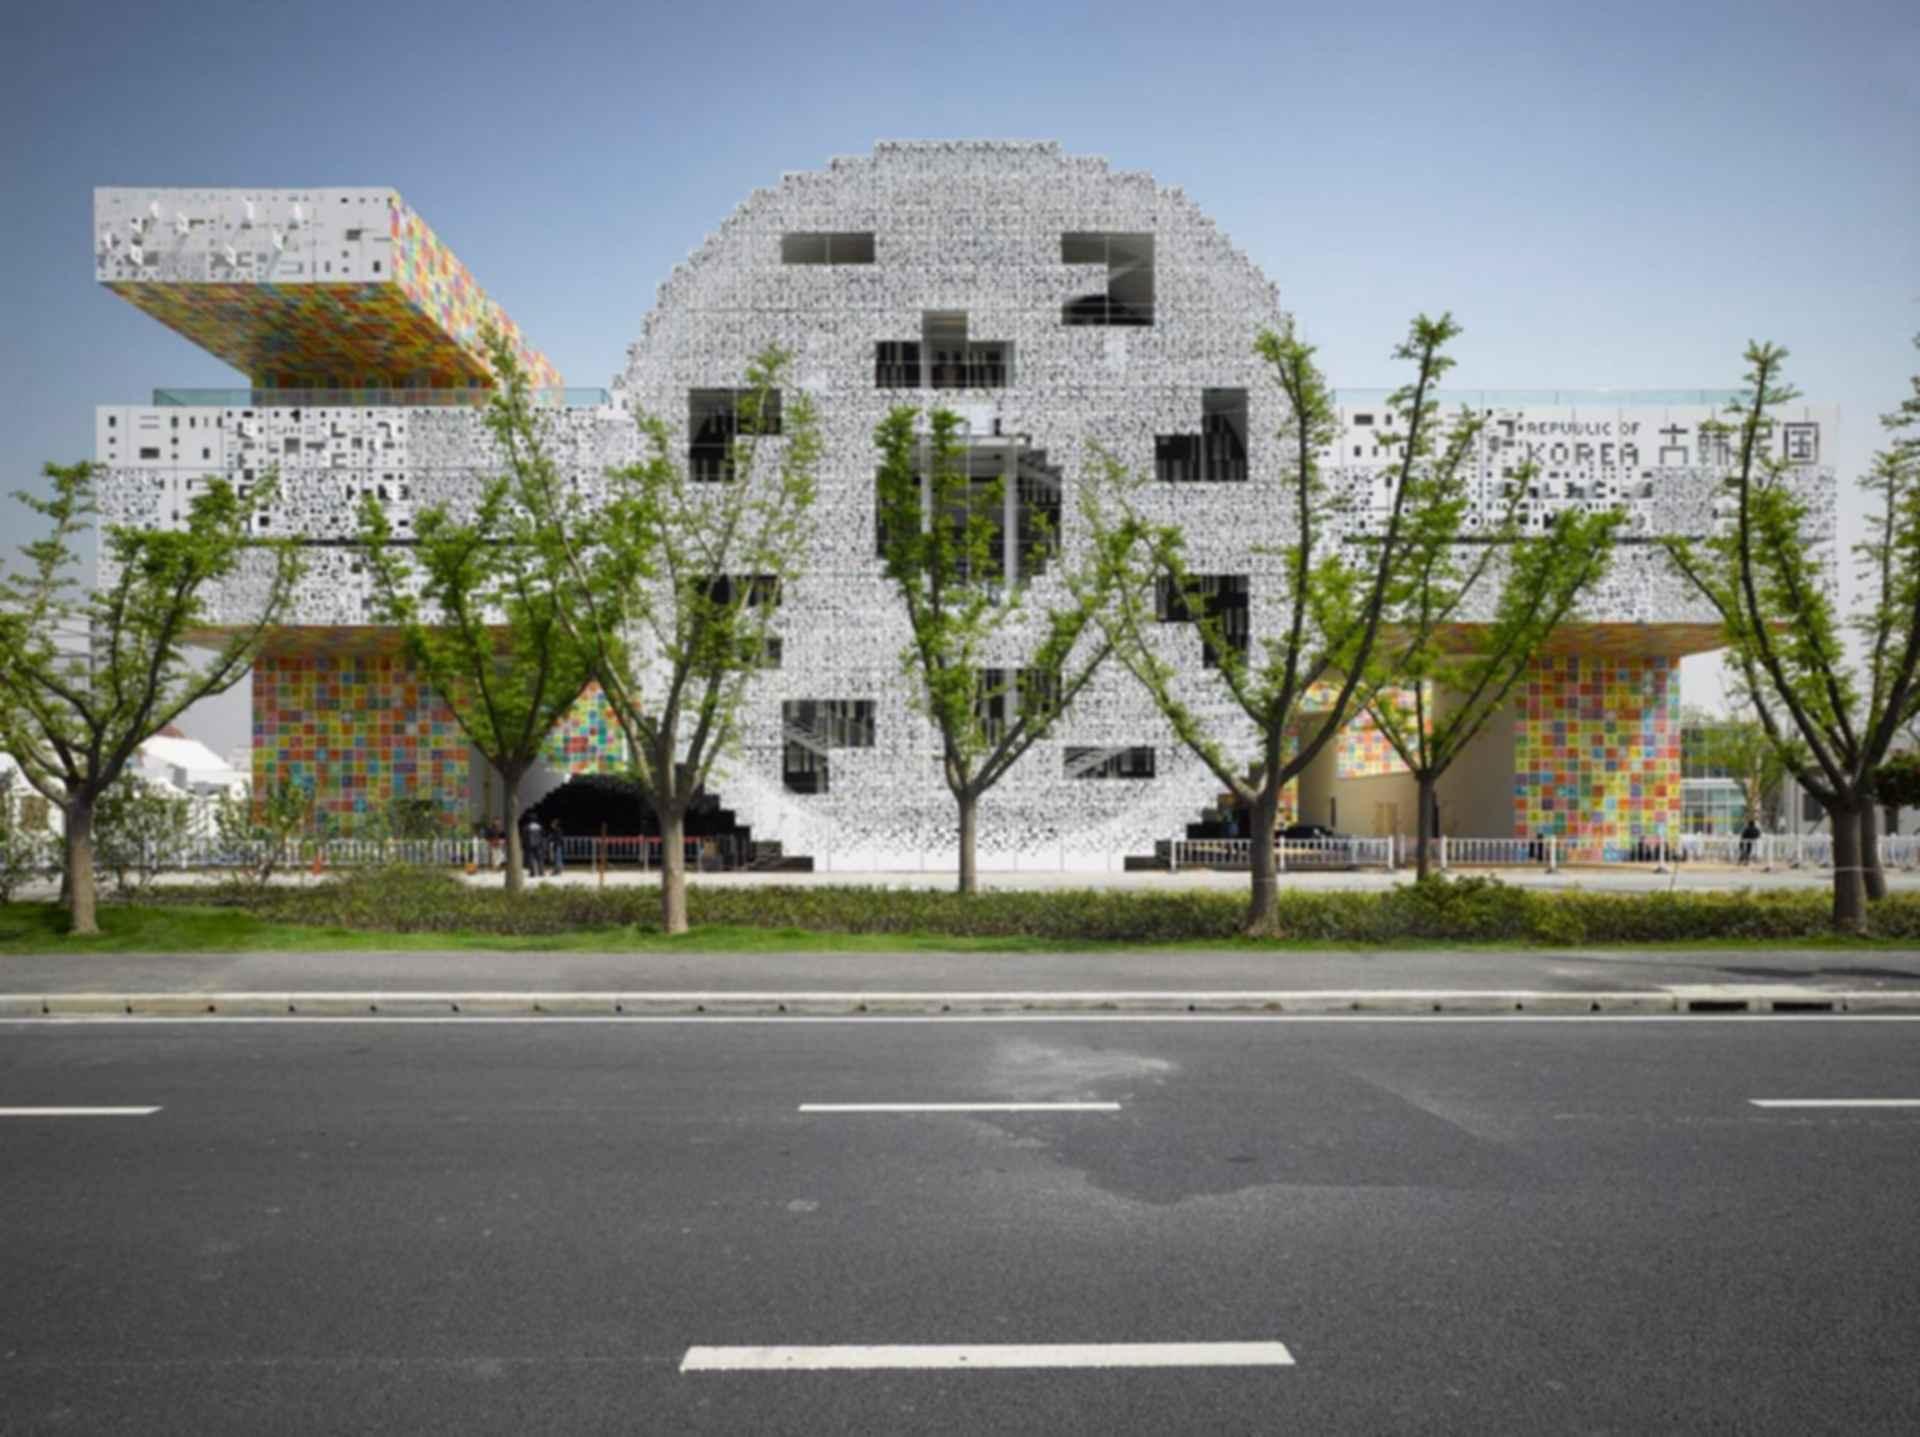 The Korean Pavilion at Shanghai World Expo 2010 - Concept Design/Exterior